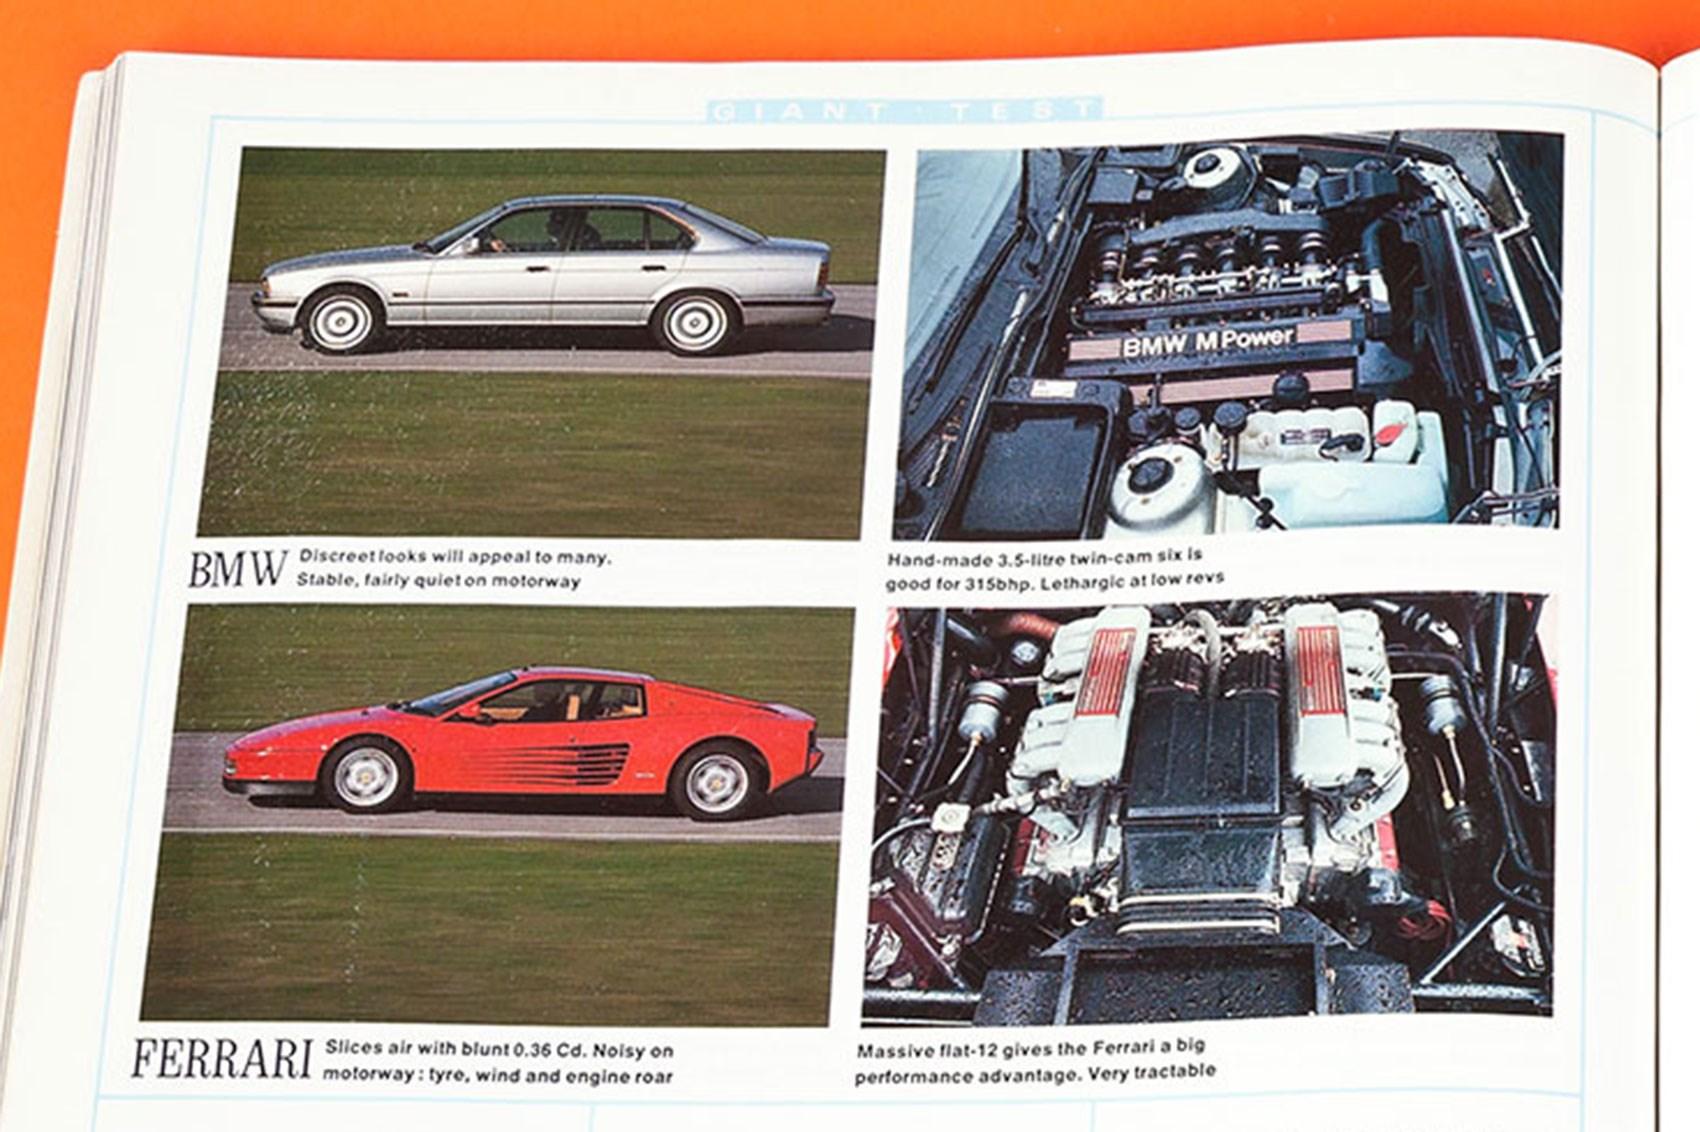 BMW M5 vs Ferrari Testarossa, CAR magazine, April 1990